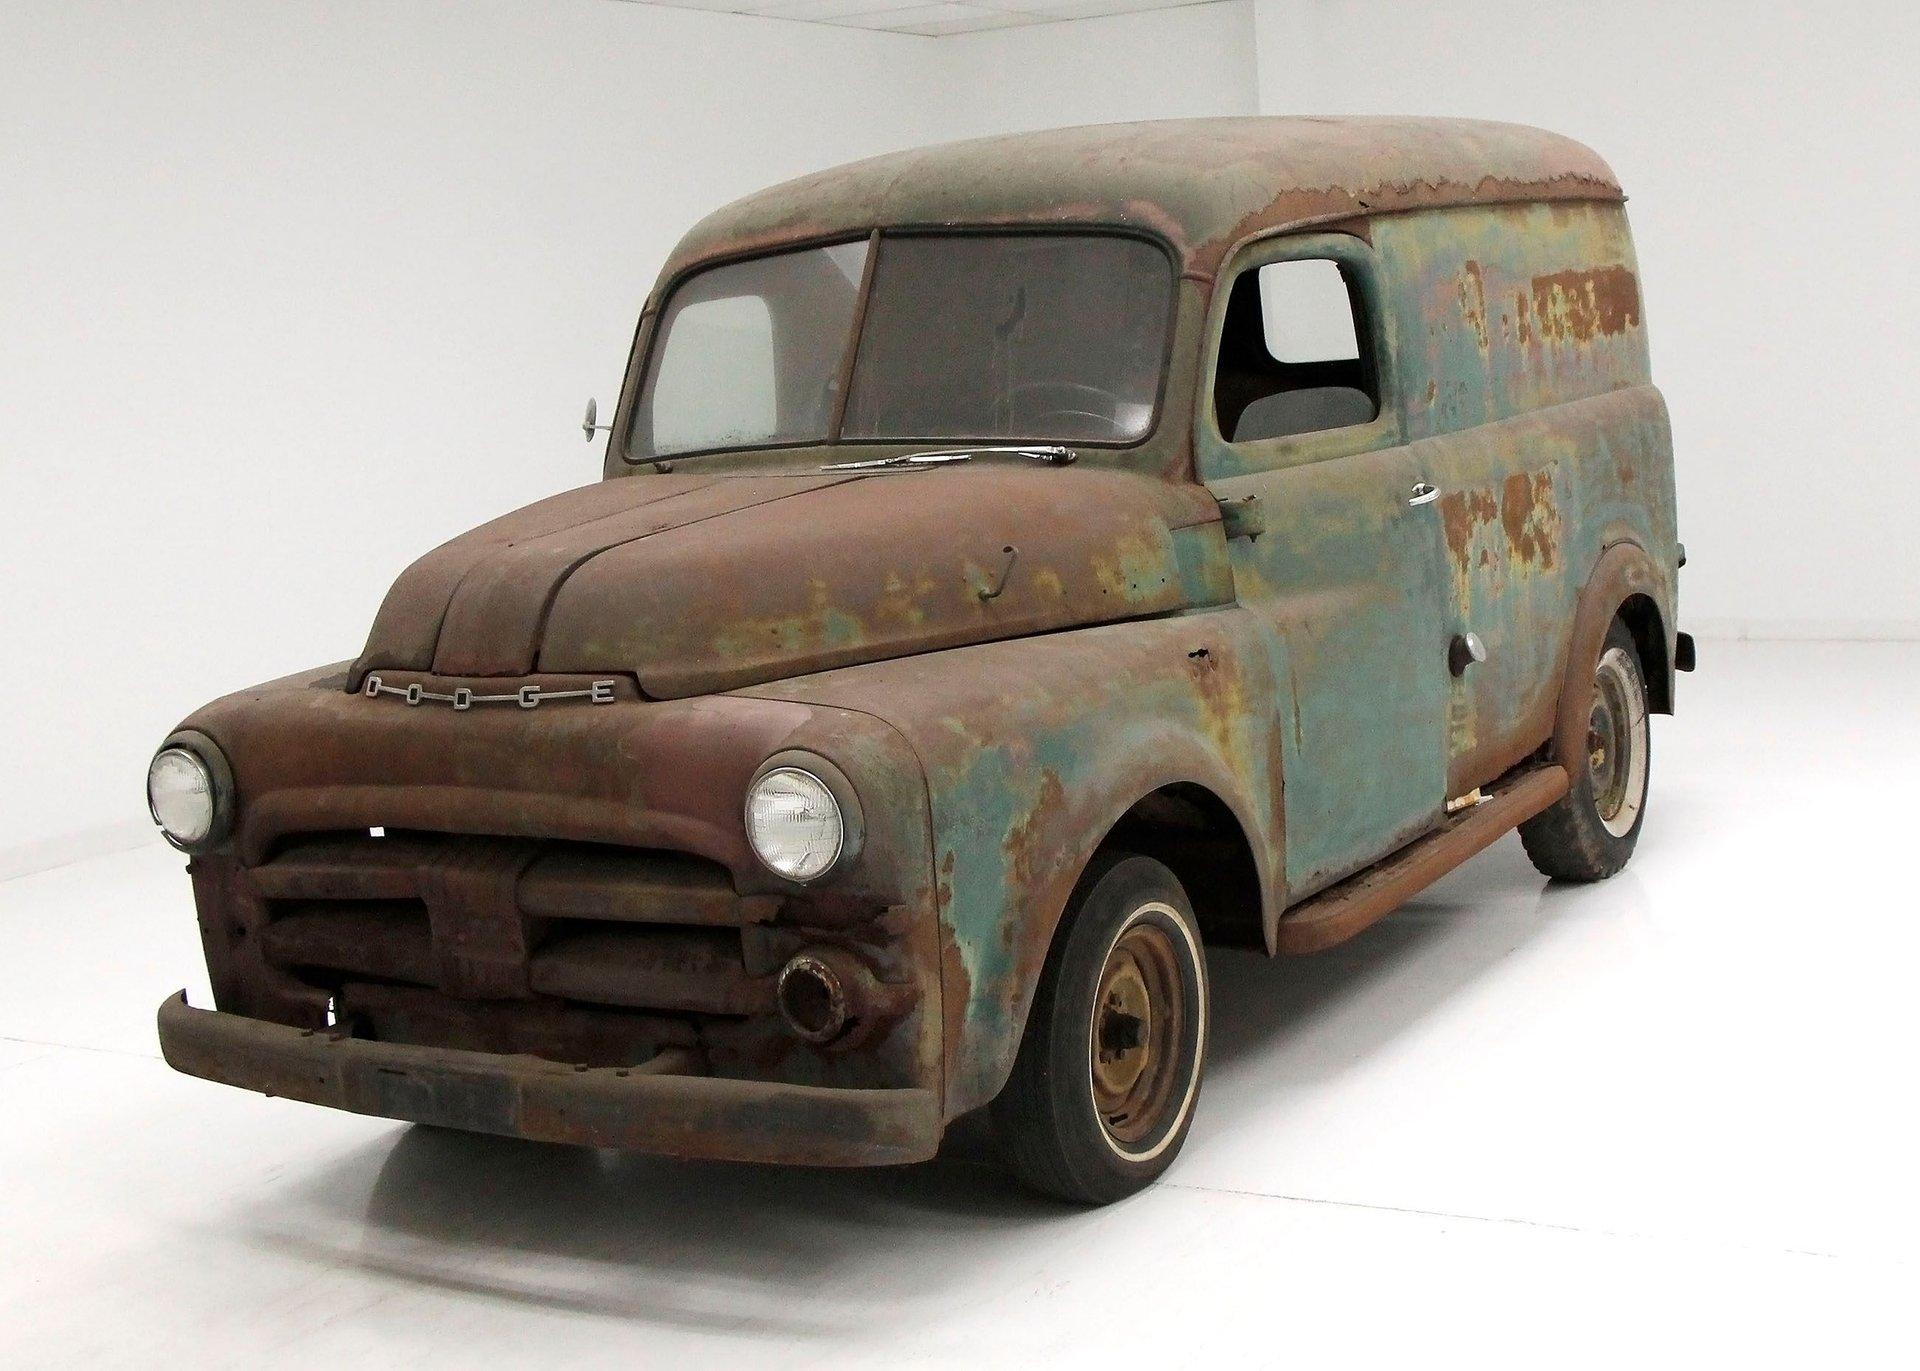 1952 Dodge Sedan Delivery